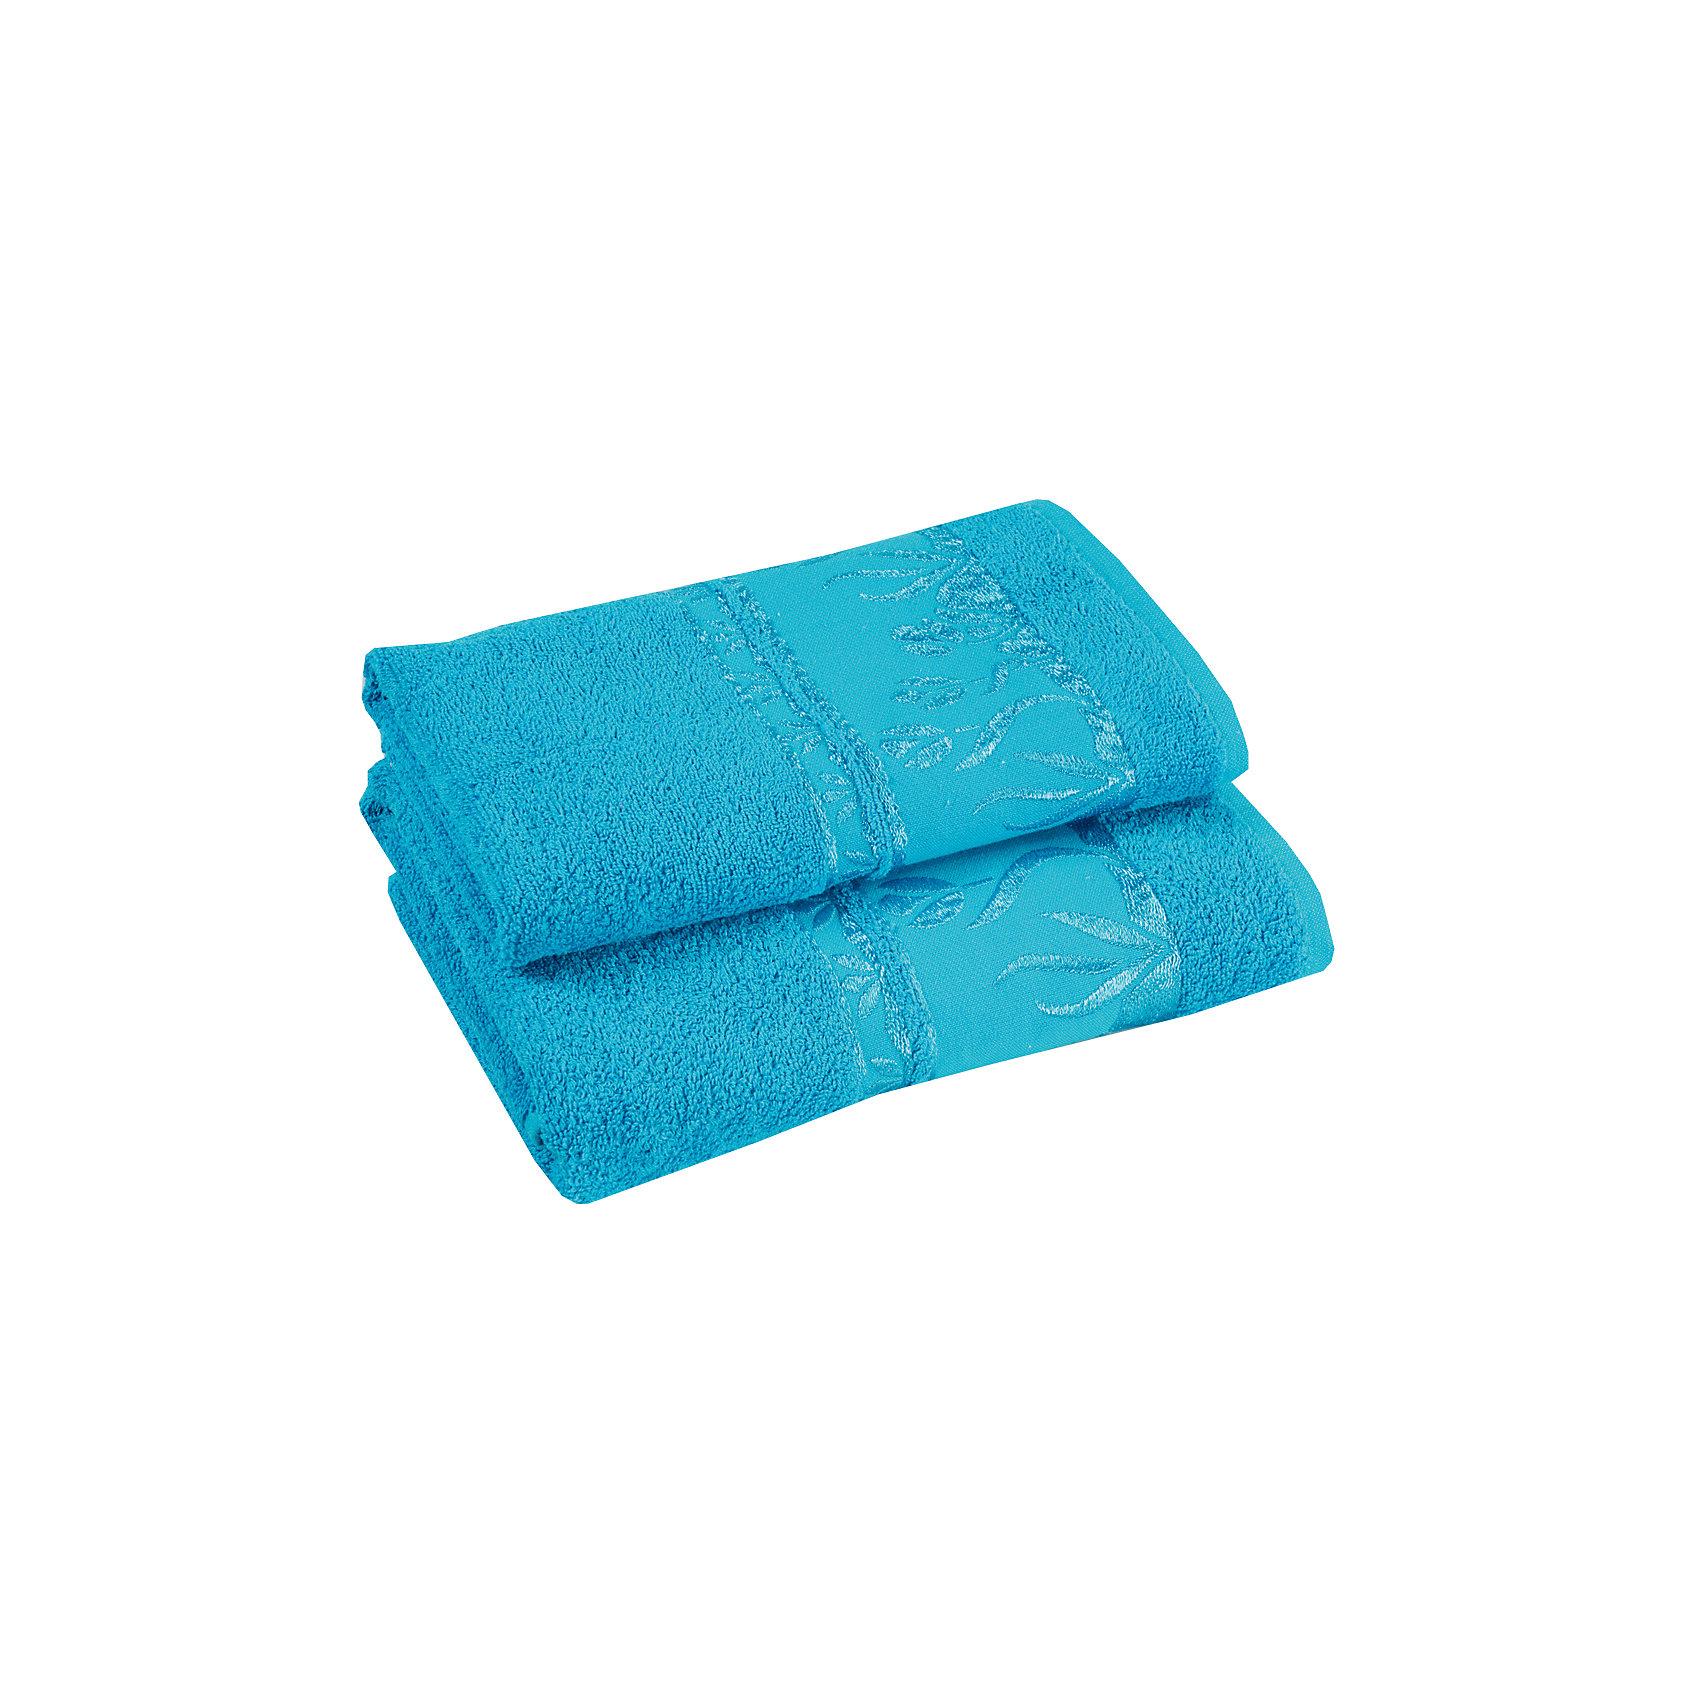 Полотенце махровое Tulips 40*75, Португалия, ярко-голубой